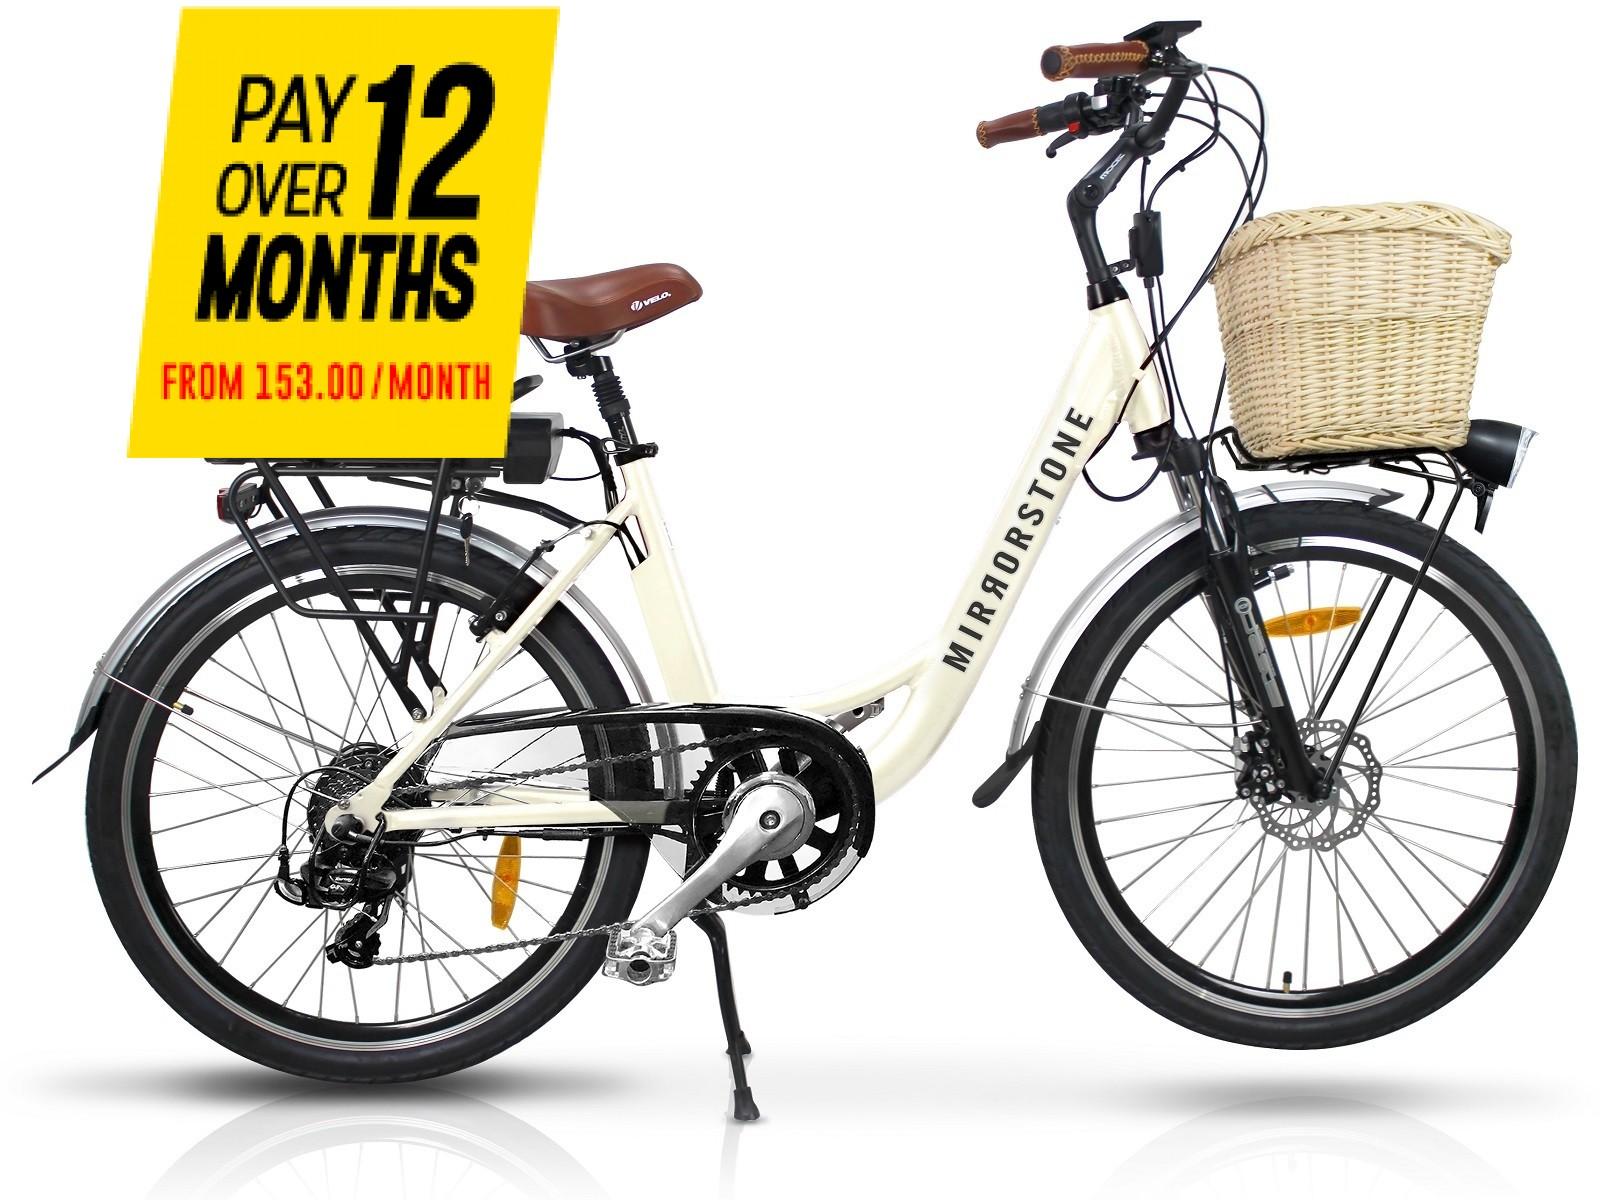 Sprint Electric Bike Milky White Wheels - Free Next Day Shipping